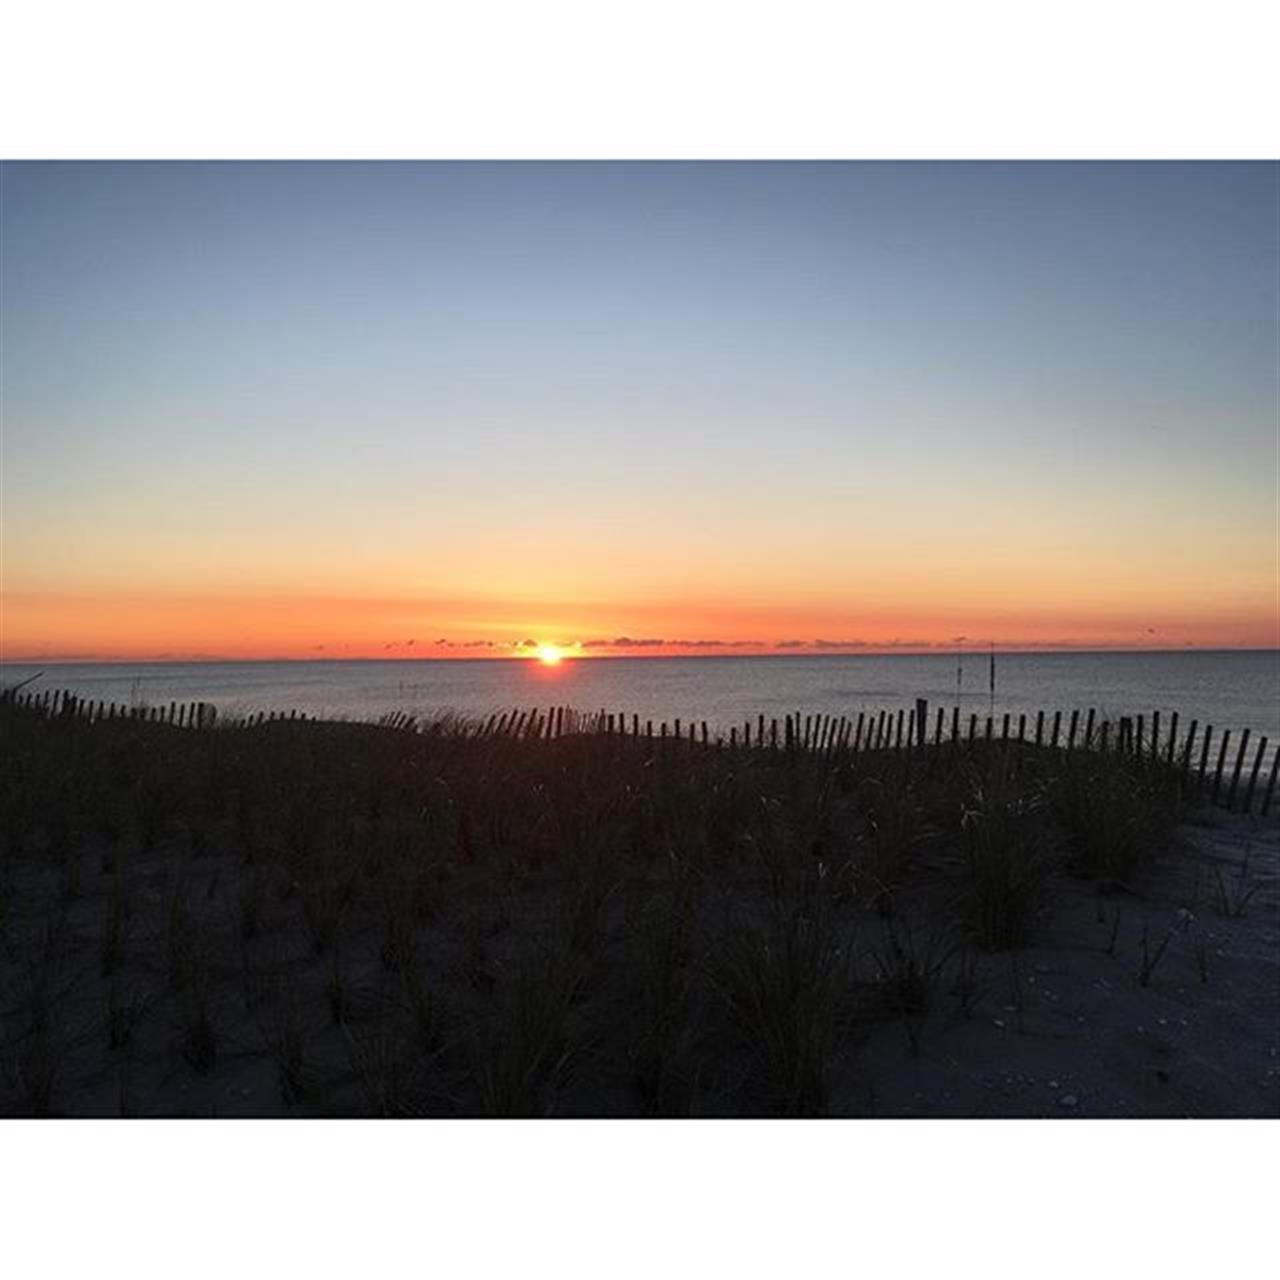 3 A classic sunrise... Have a good week!  #sunrise #nj #goodmorning #beach #jshn